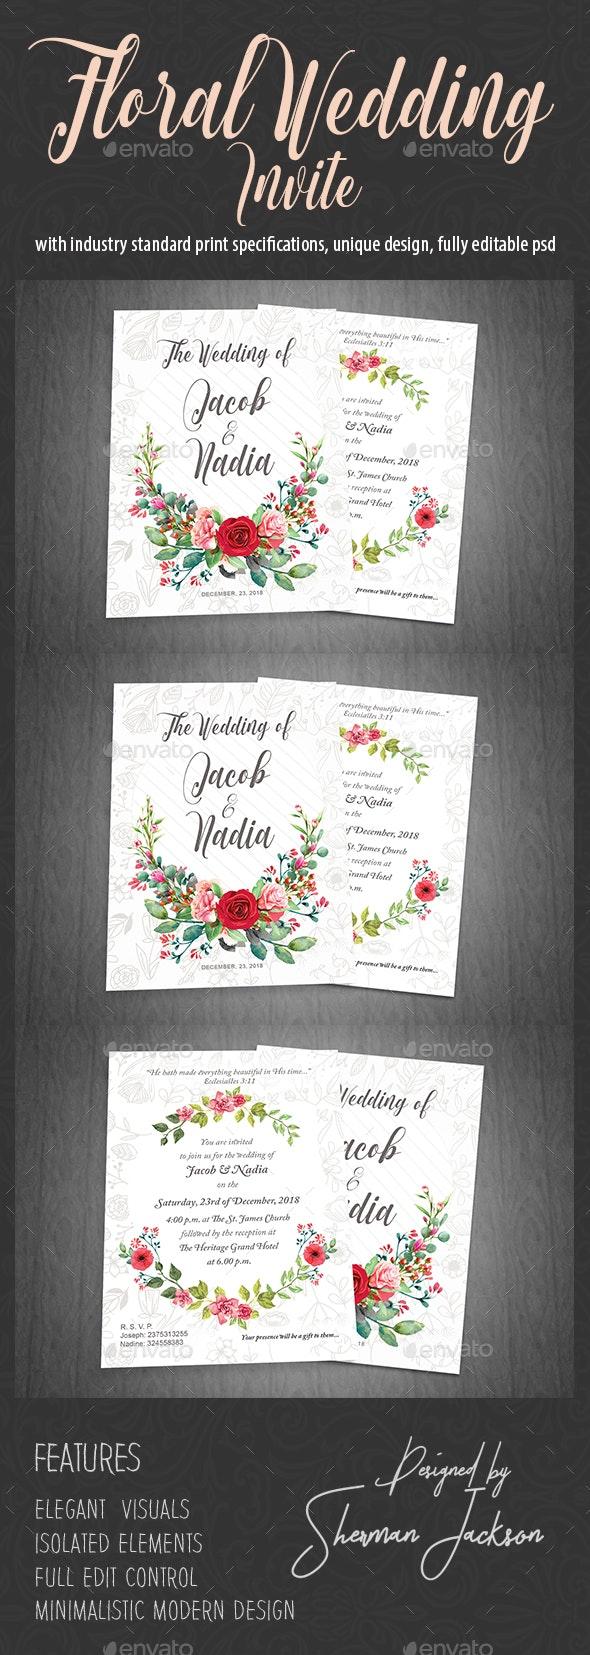 Floral Wedding Invite - Weddings Cards & Invites